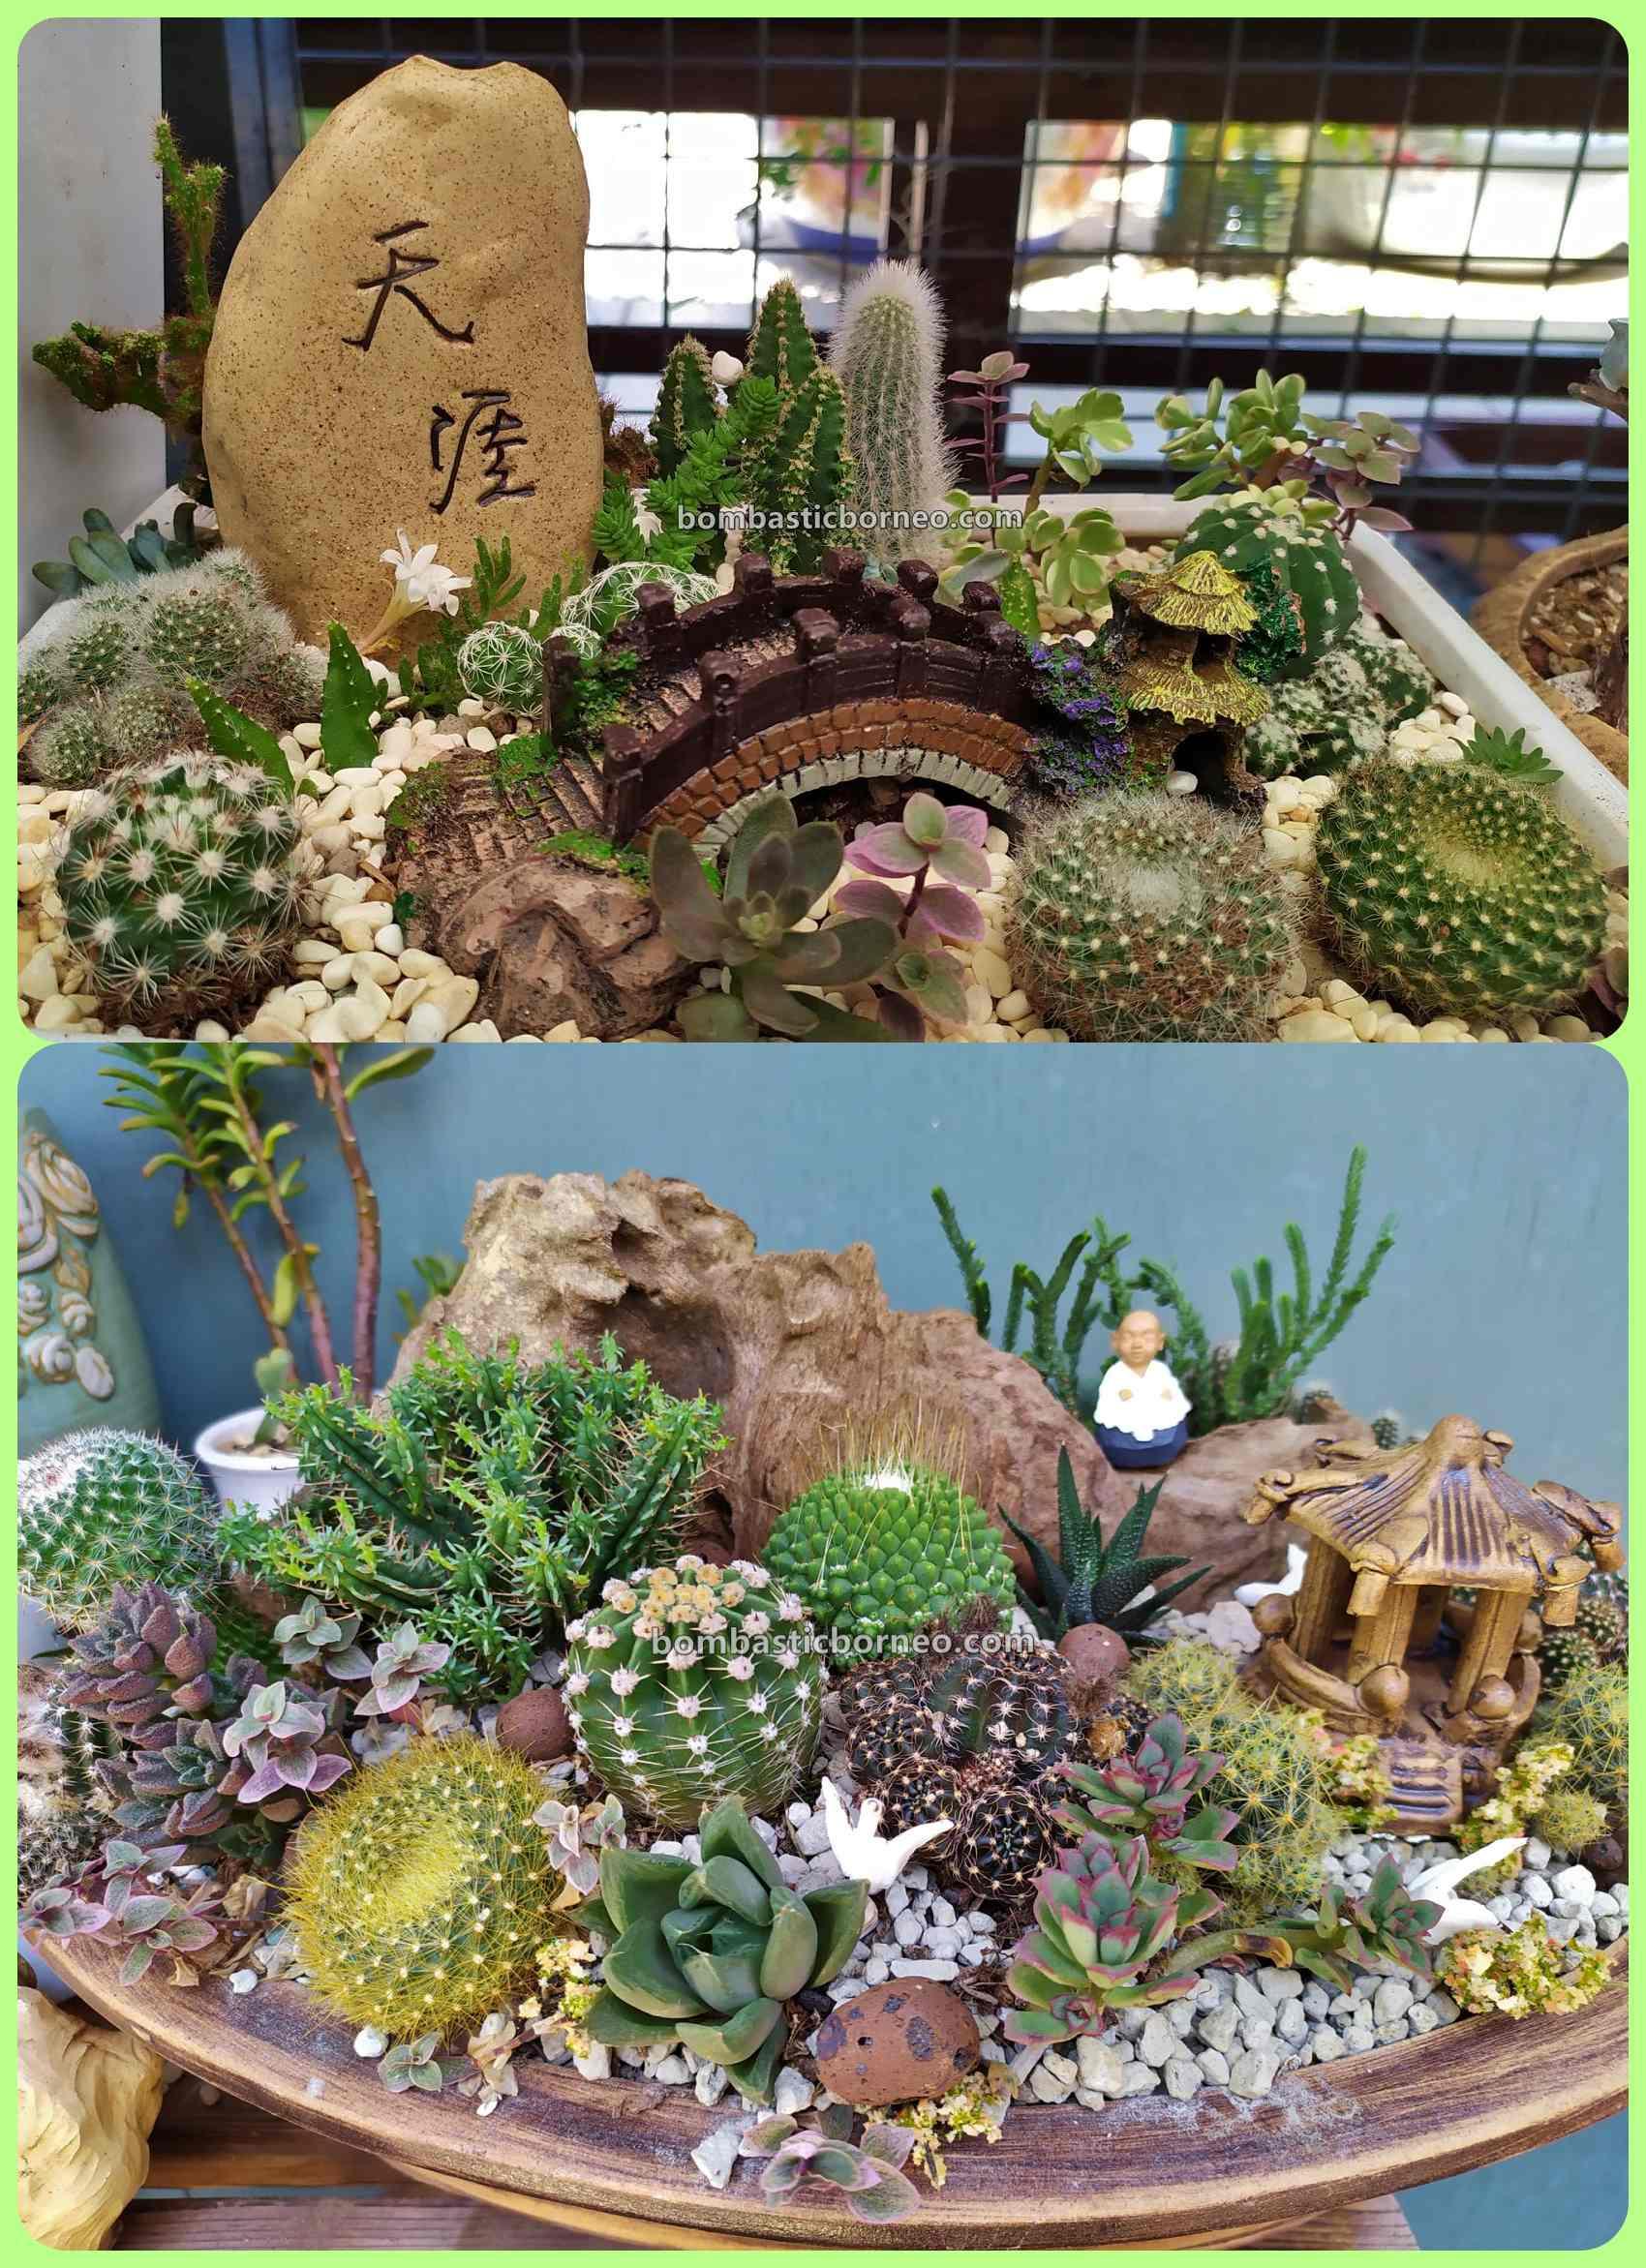 LS Succulent Garden, cacti, Desert Plants, Tanaman Kaktus, botany, nature, exploration, hobby, Malaysia, Tourism, tourist attraction, Trans Borneo, 探索婆罗洲砂拉越, 马来西亚美里, 肉肉仙人掌植物